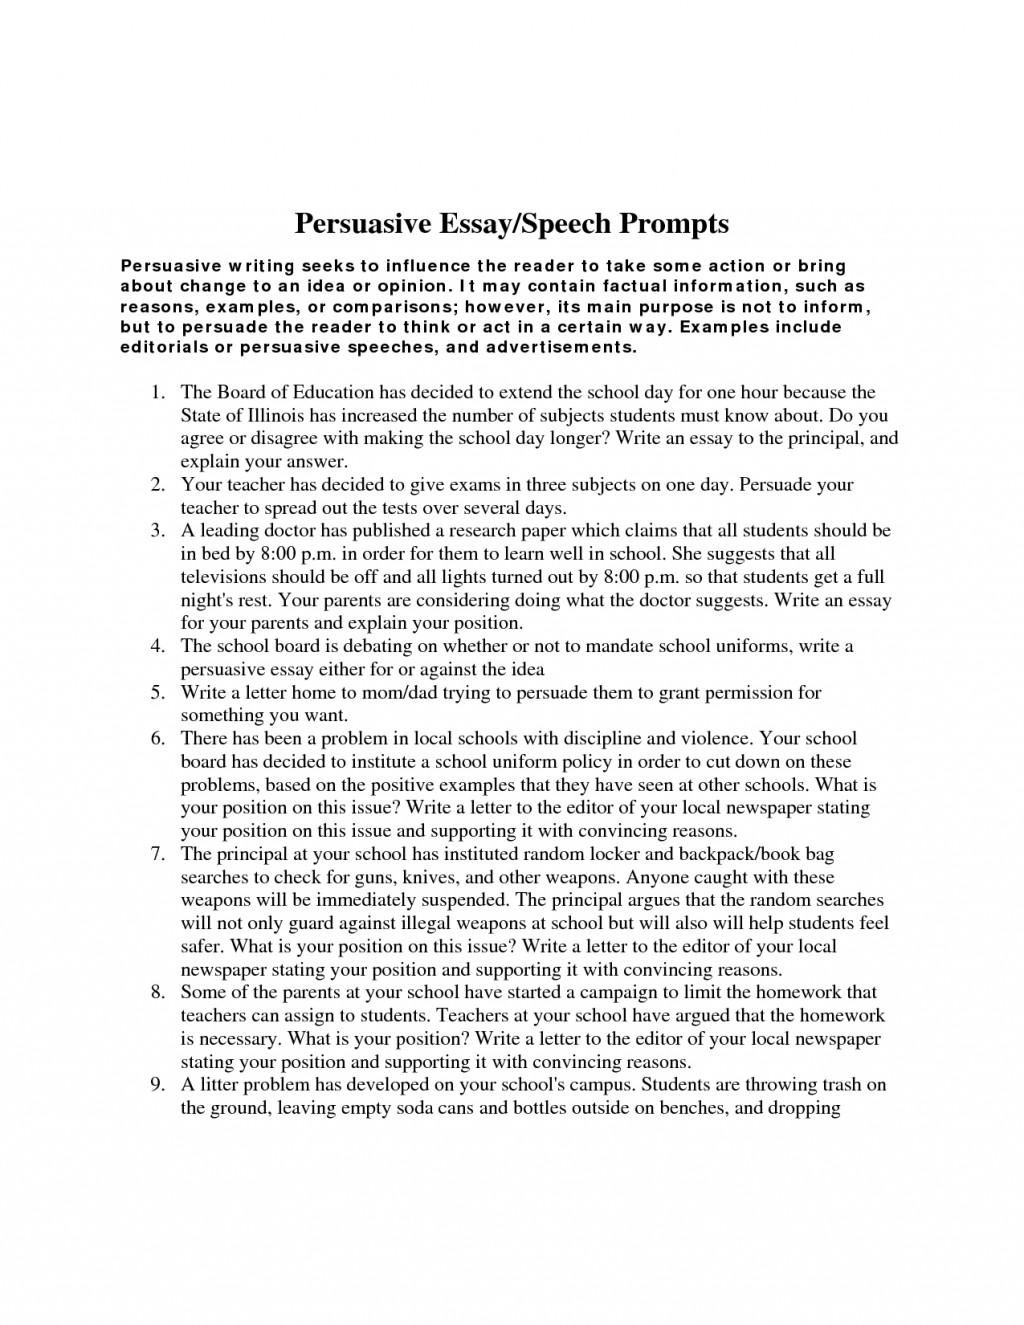 020 Persuasive Essay Prompts Good Topics Amazing 2018 Uk Argumentative High School Large